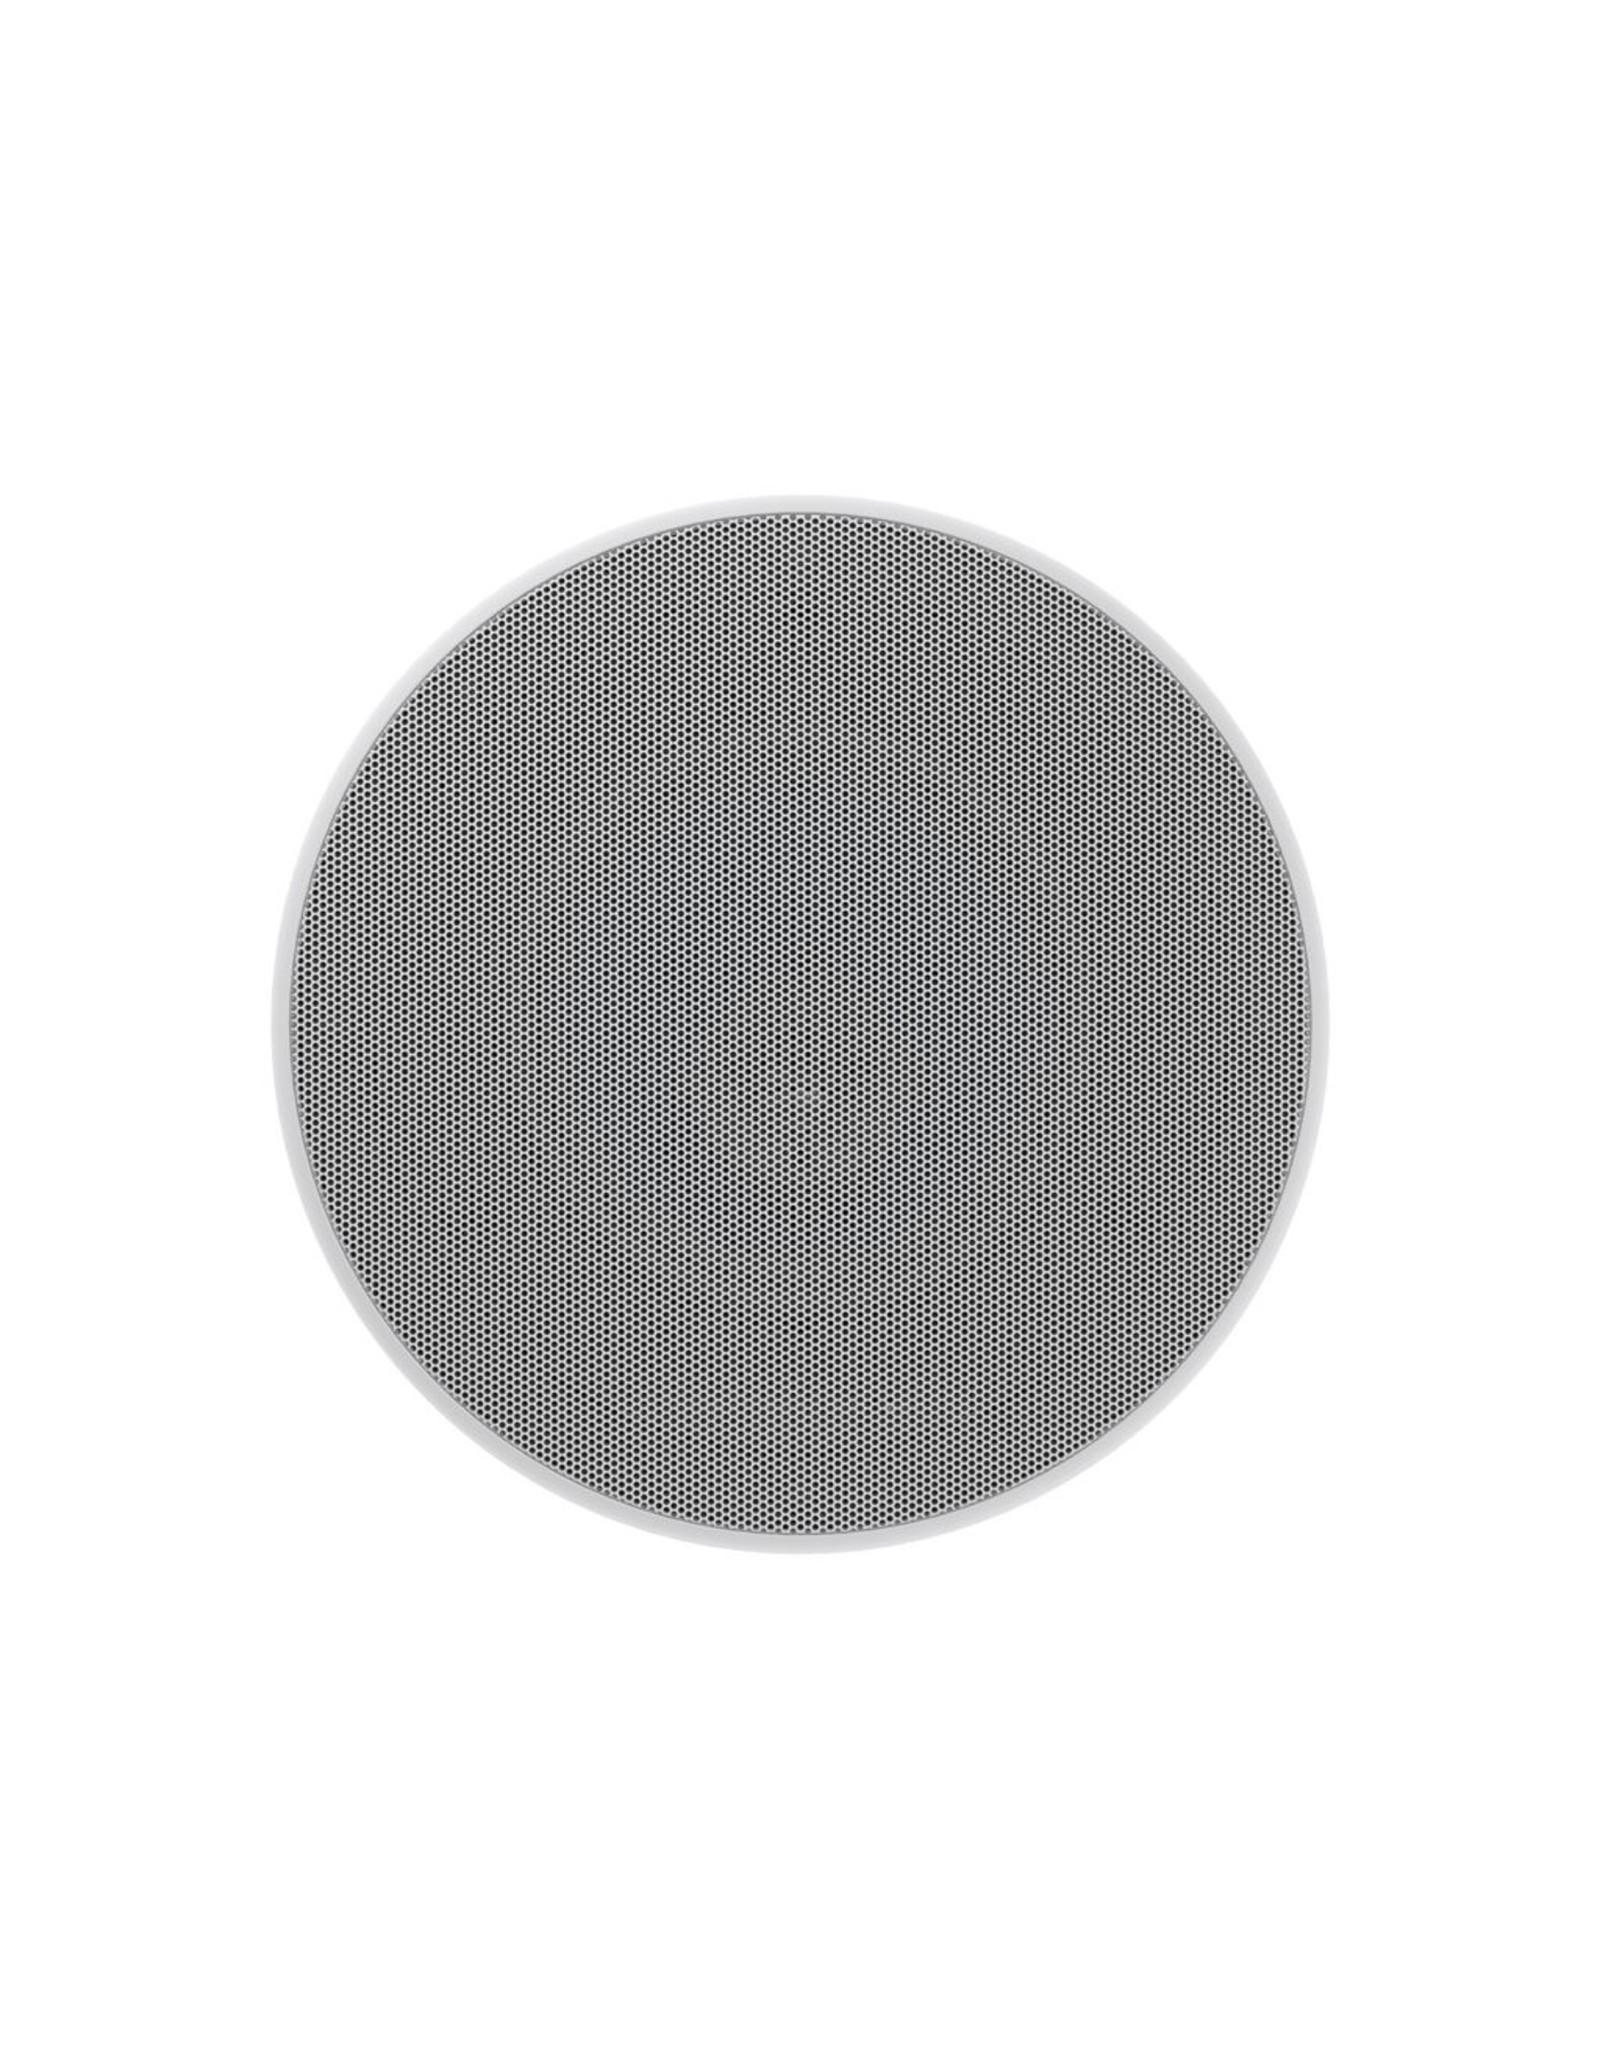 BOWERS & WILKINS B&W CCM663 In Ceiling Speakers (pair) WHITE